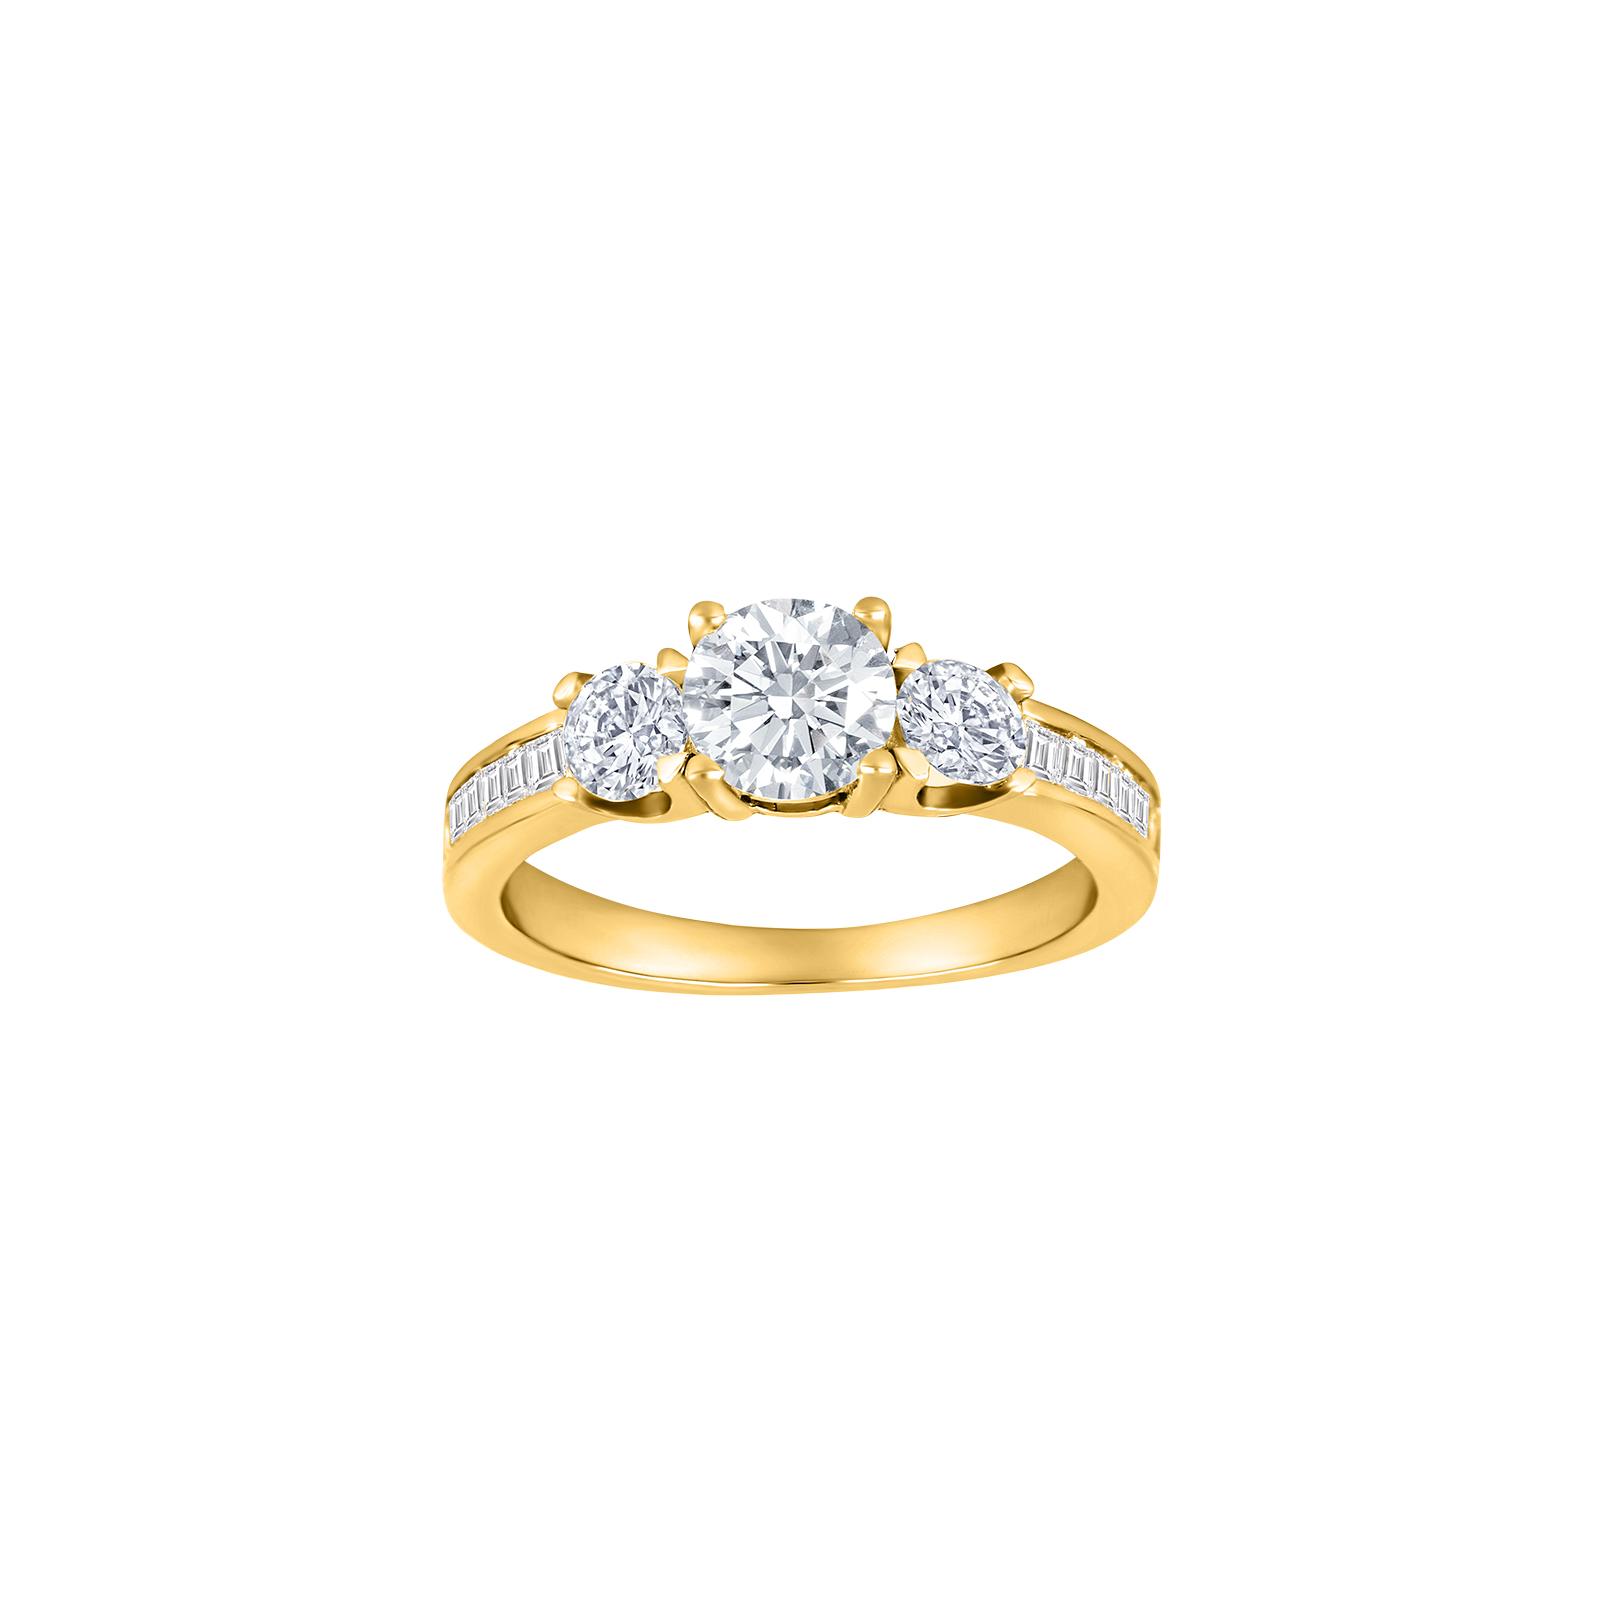 Elegant forgyldt sølv ring med zirkoner fra Joanli Nor Oplev denne smukke rhodineret sølv ring med zirkoner fra Joanli Nor. Ringen er prydet med små smukke zirkoner ned langs ringskinnen og omkring centerstenen. Ringen fås i rhodineret sølv og forgyldt sølv. Se det store udvalg af smykker fra Joanli Nor her